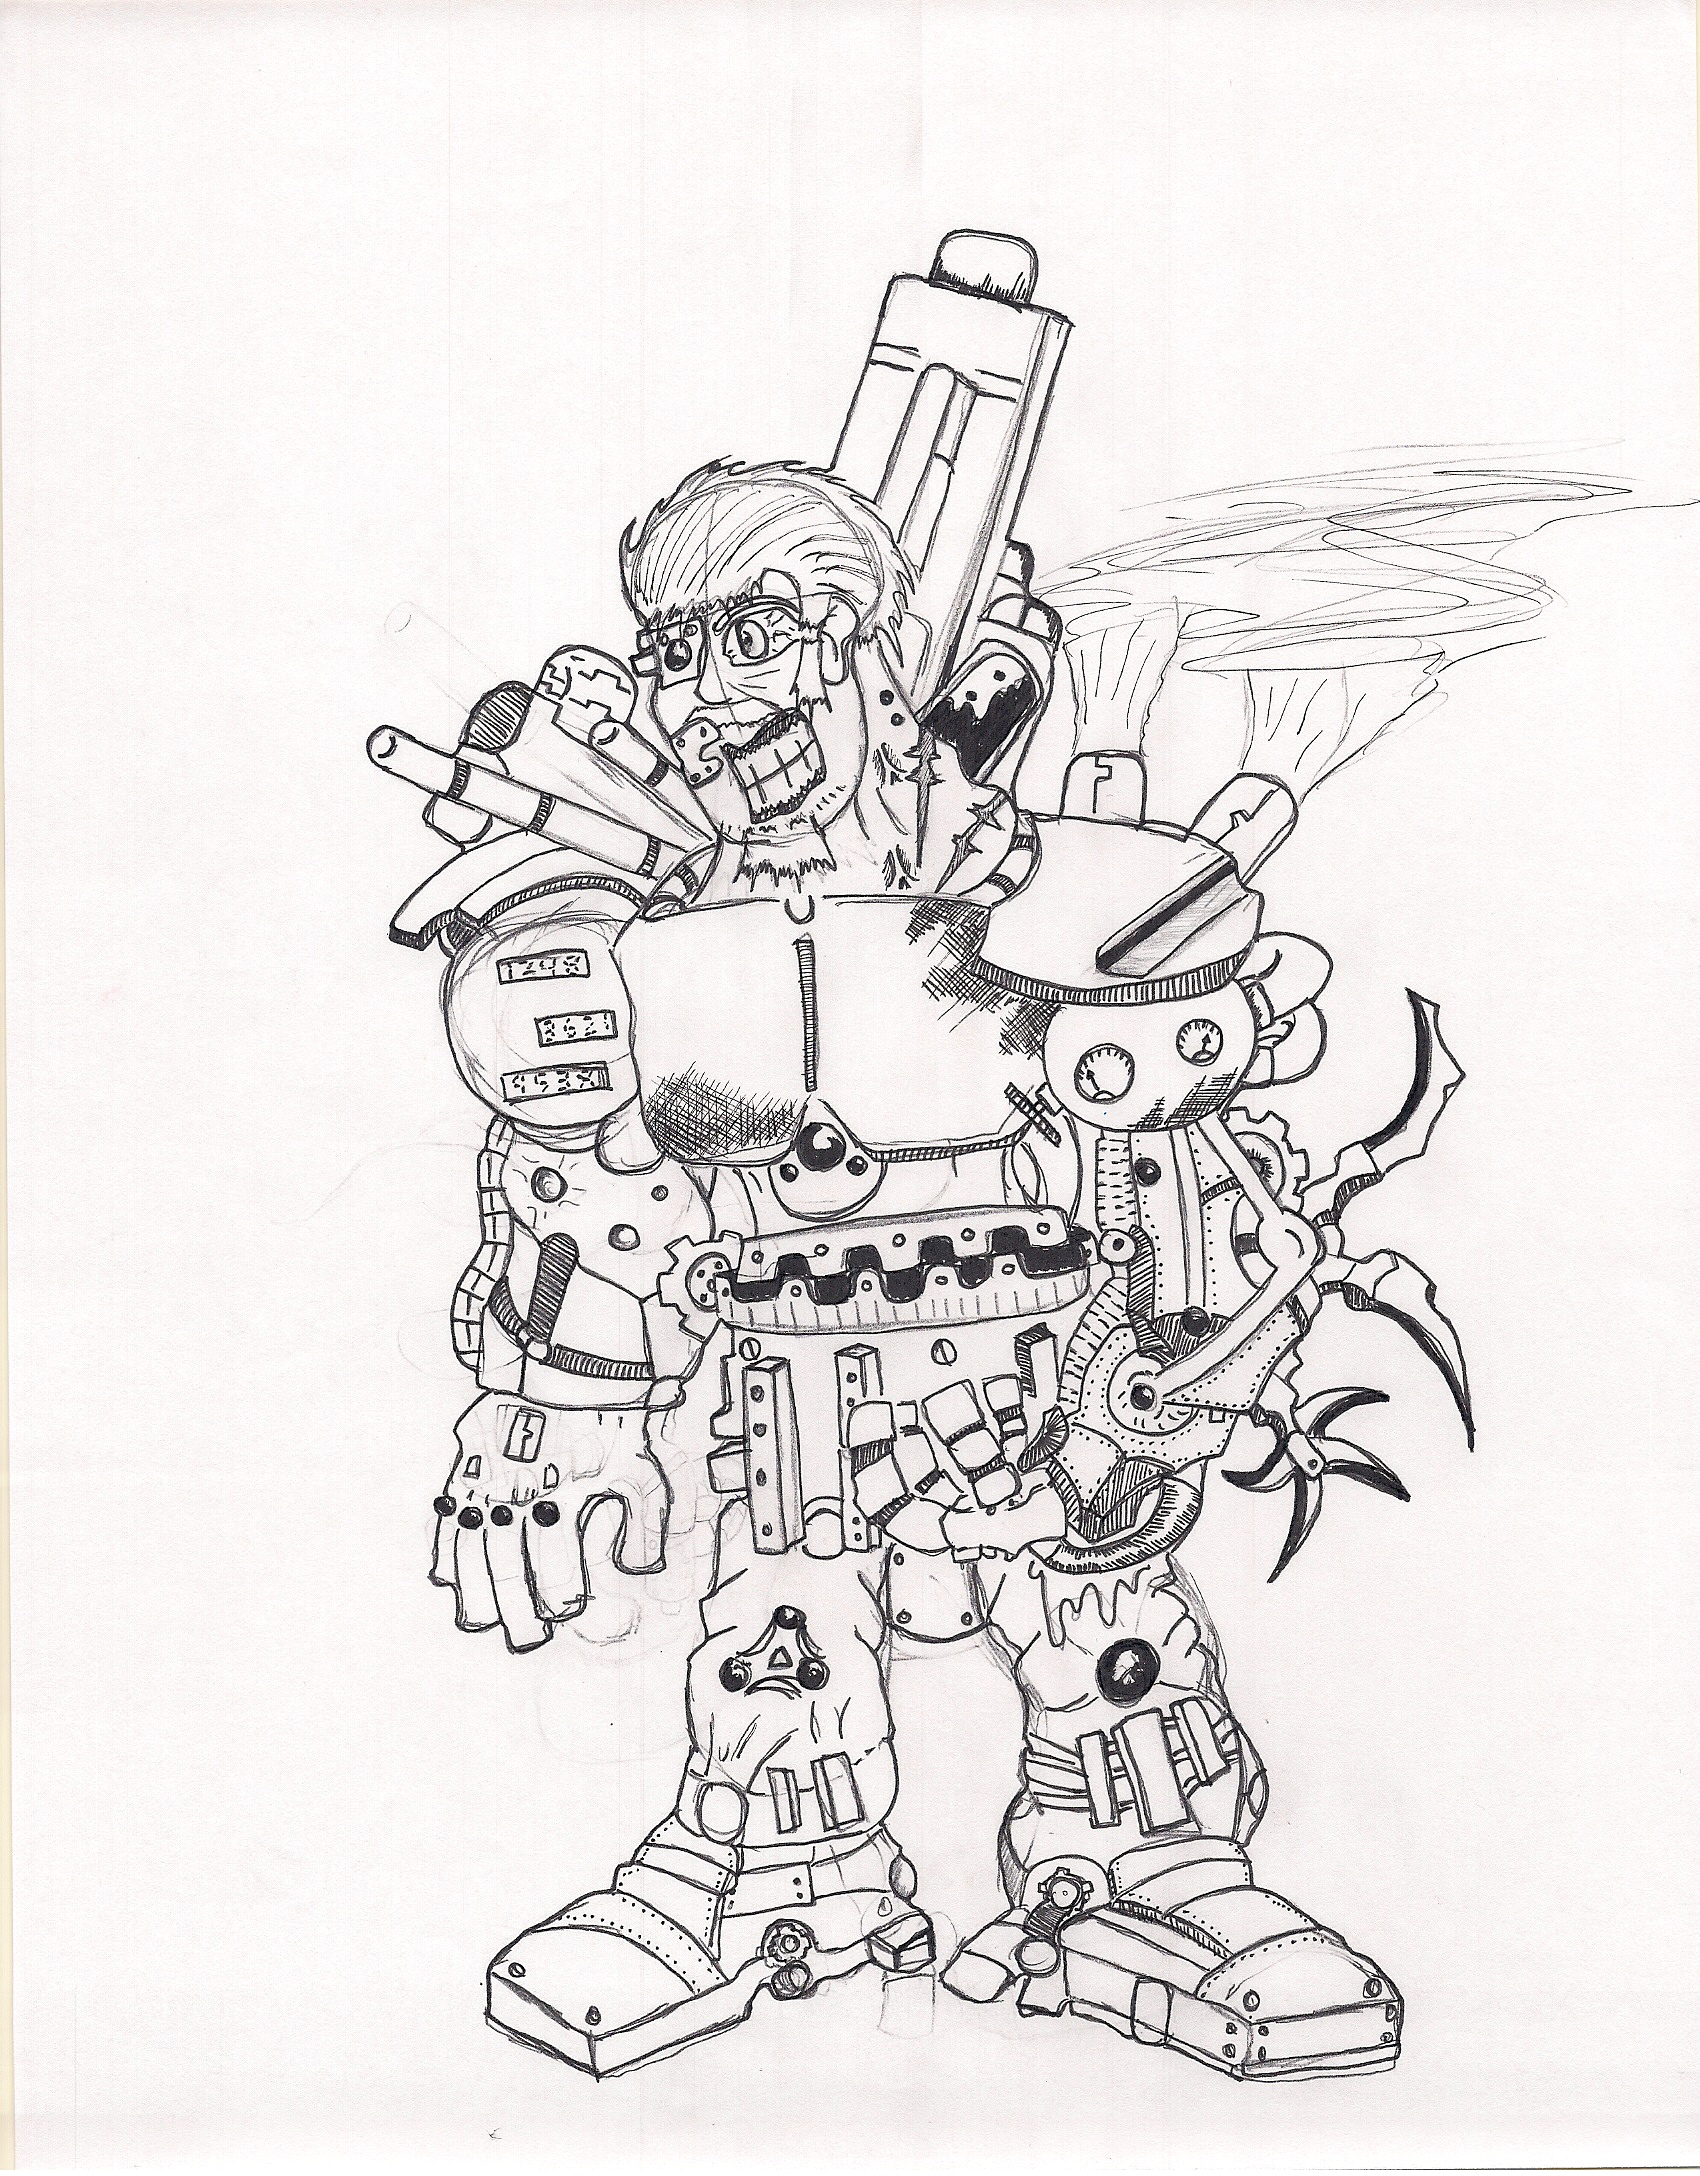 Scrap man by Sturm75